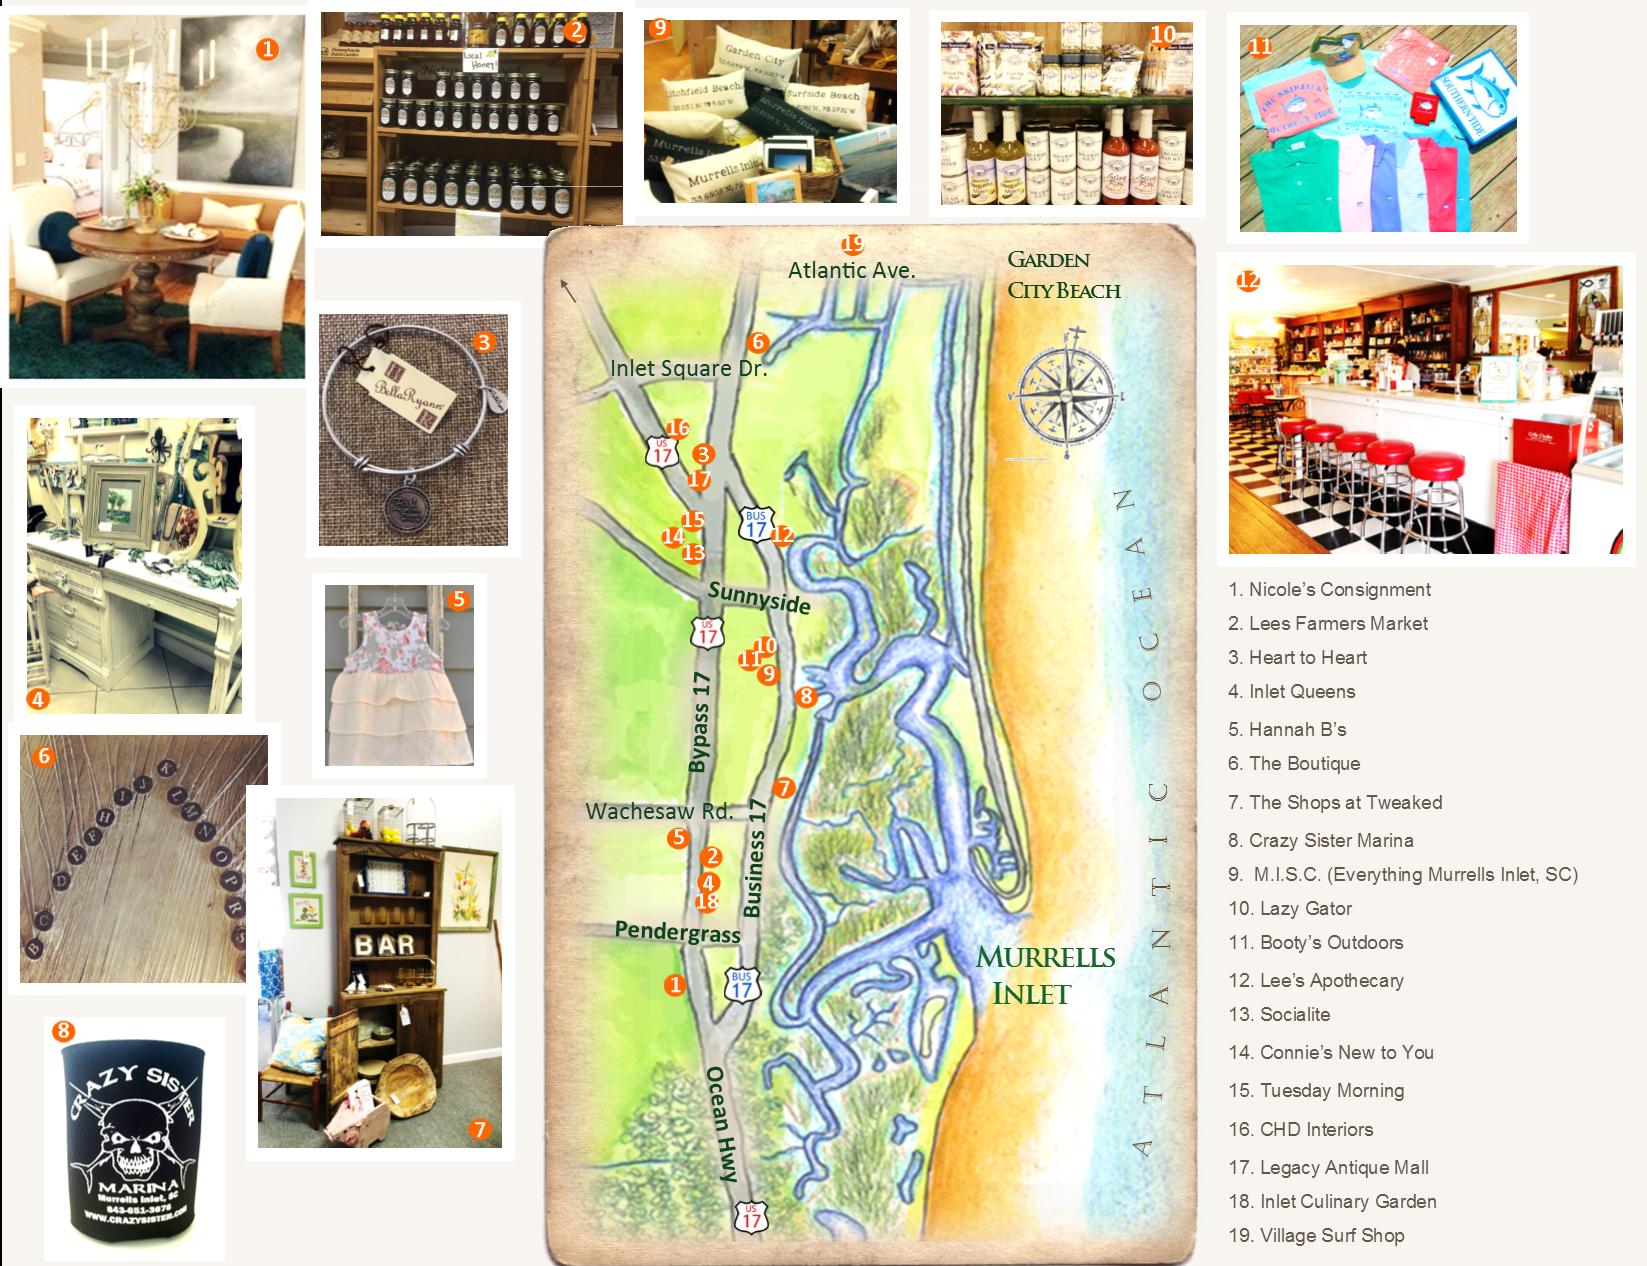 Myrtle Beach Shopping - Tanger Outlets & Hammock Shops